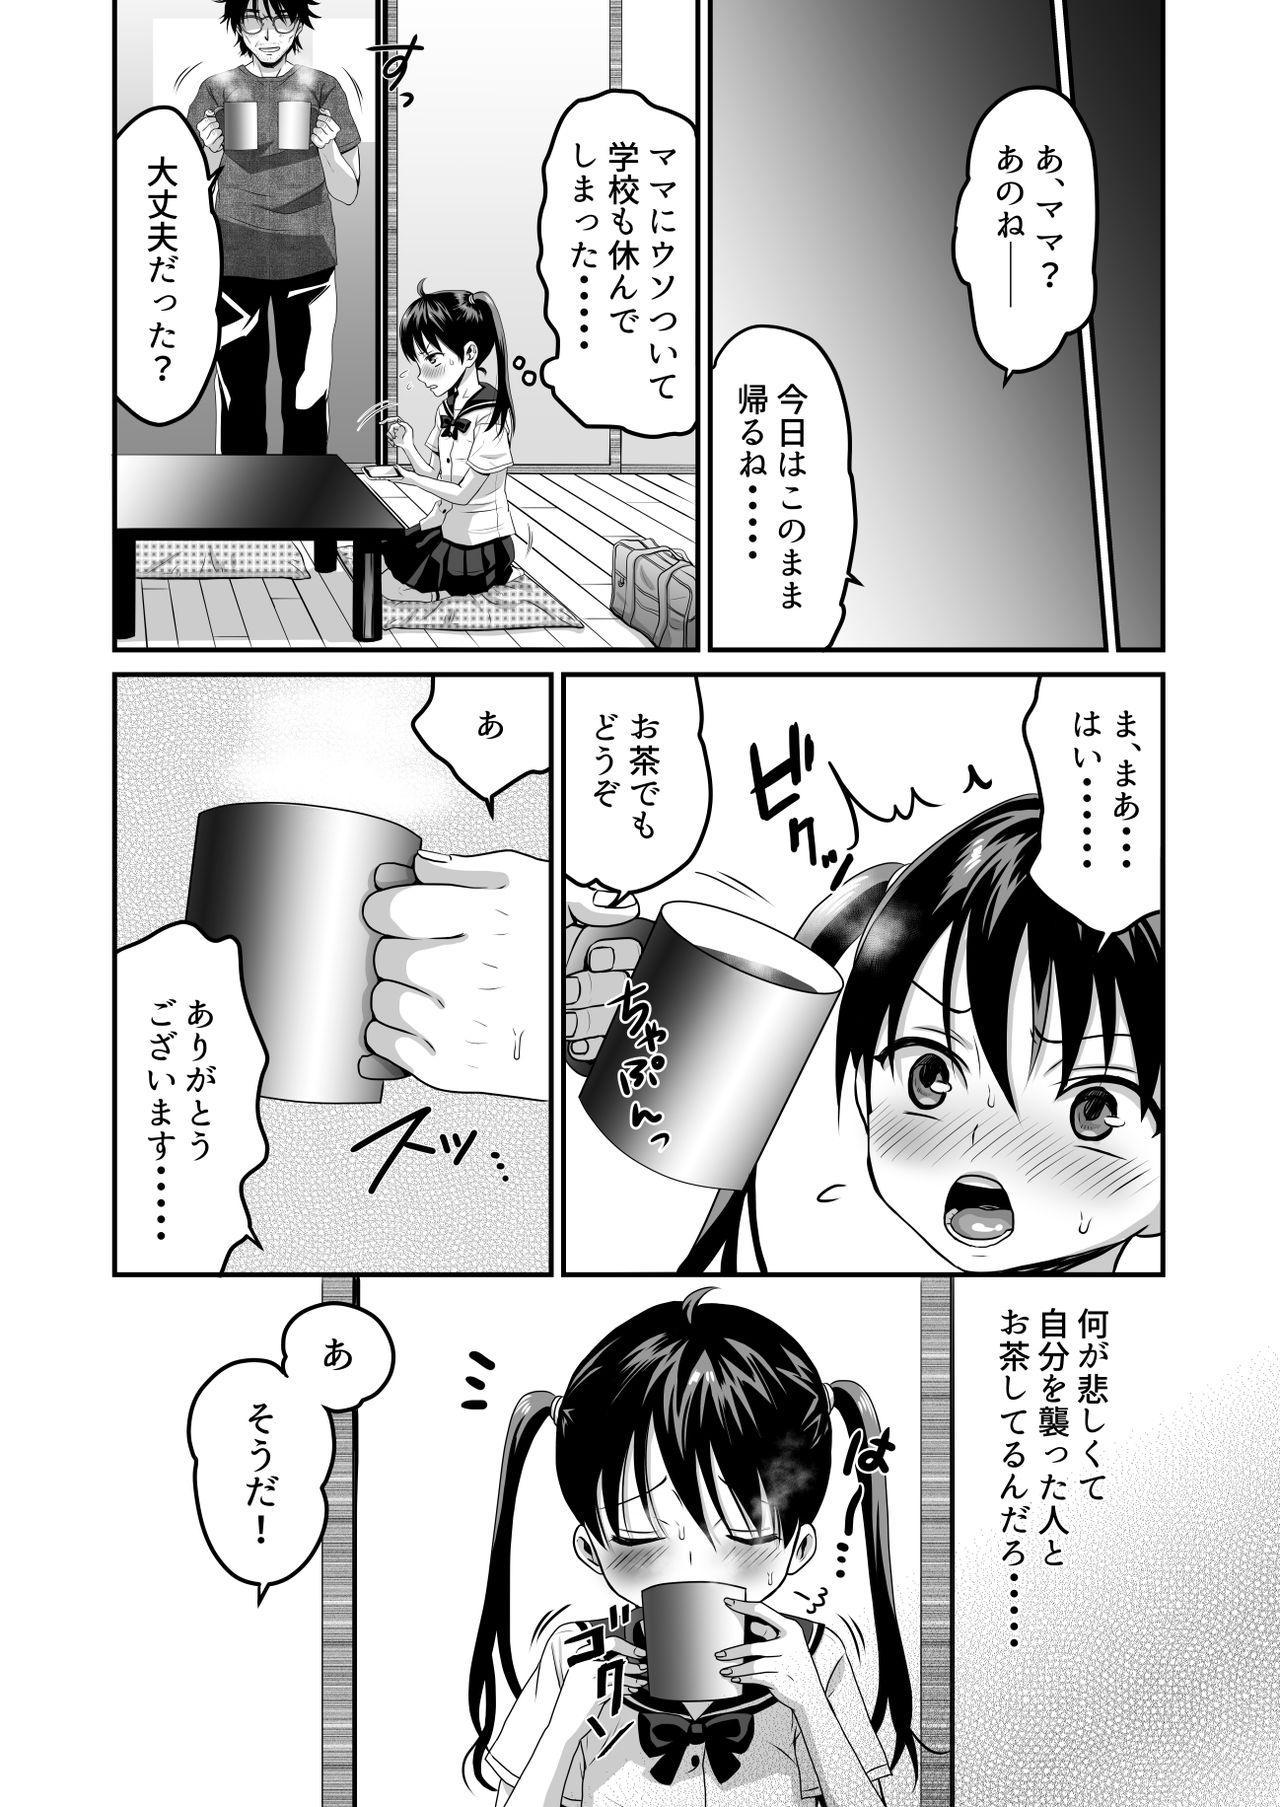 Otonari-san wa AV Danyuu 31